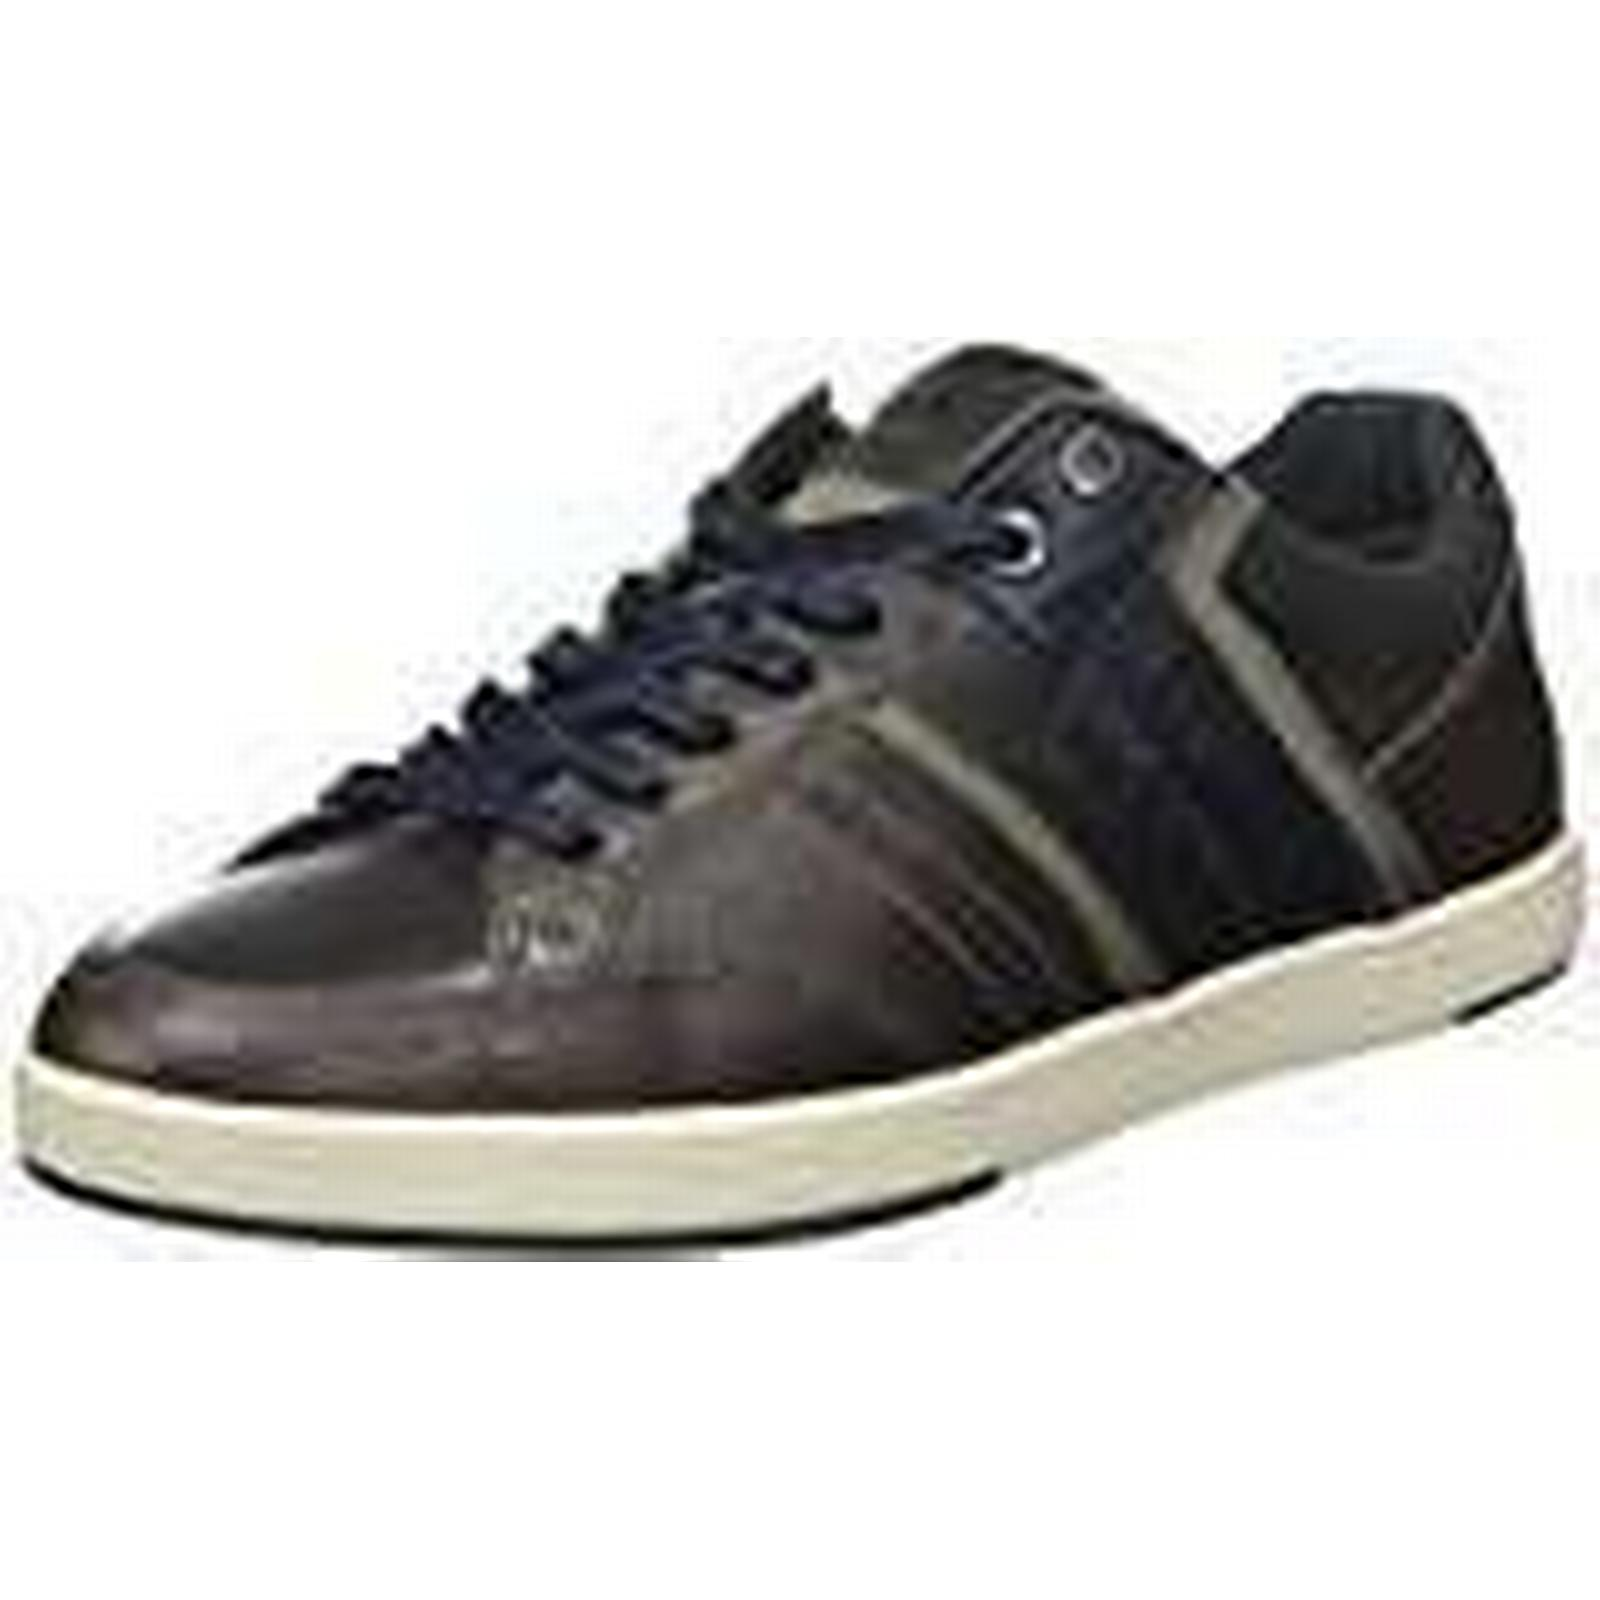 Levi's 58), Men's Beyers Low-Top Sneakers, (Dull Grey 58), Levi's 8 UK 8 UK f38b97